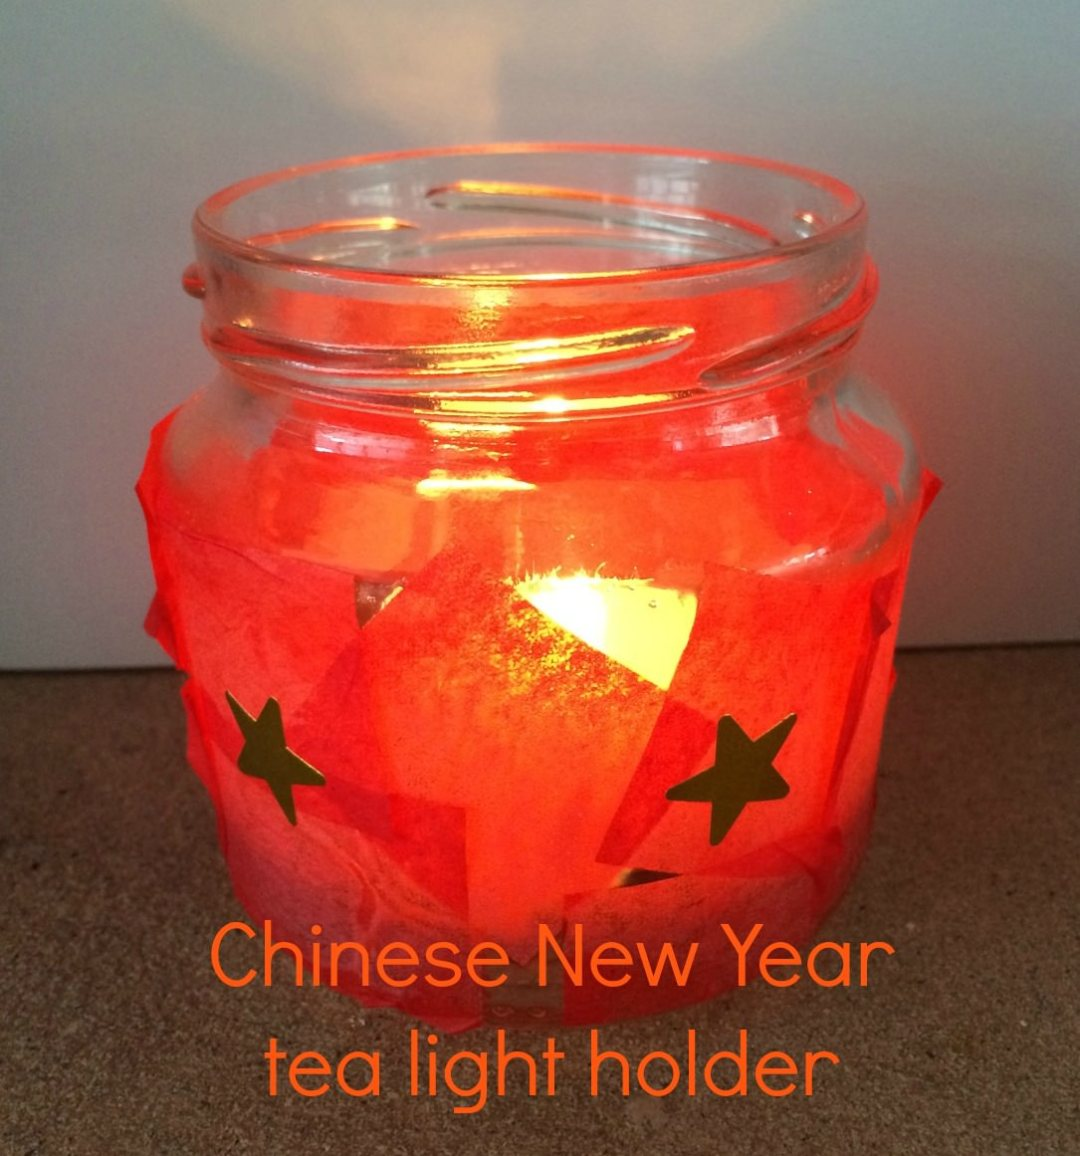 Chinese new year tea light